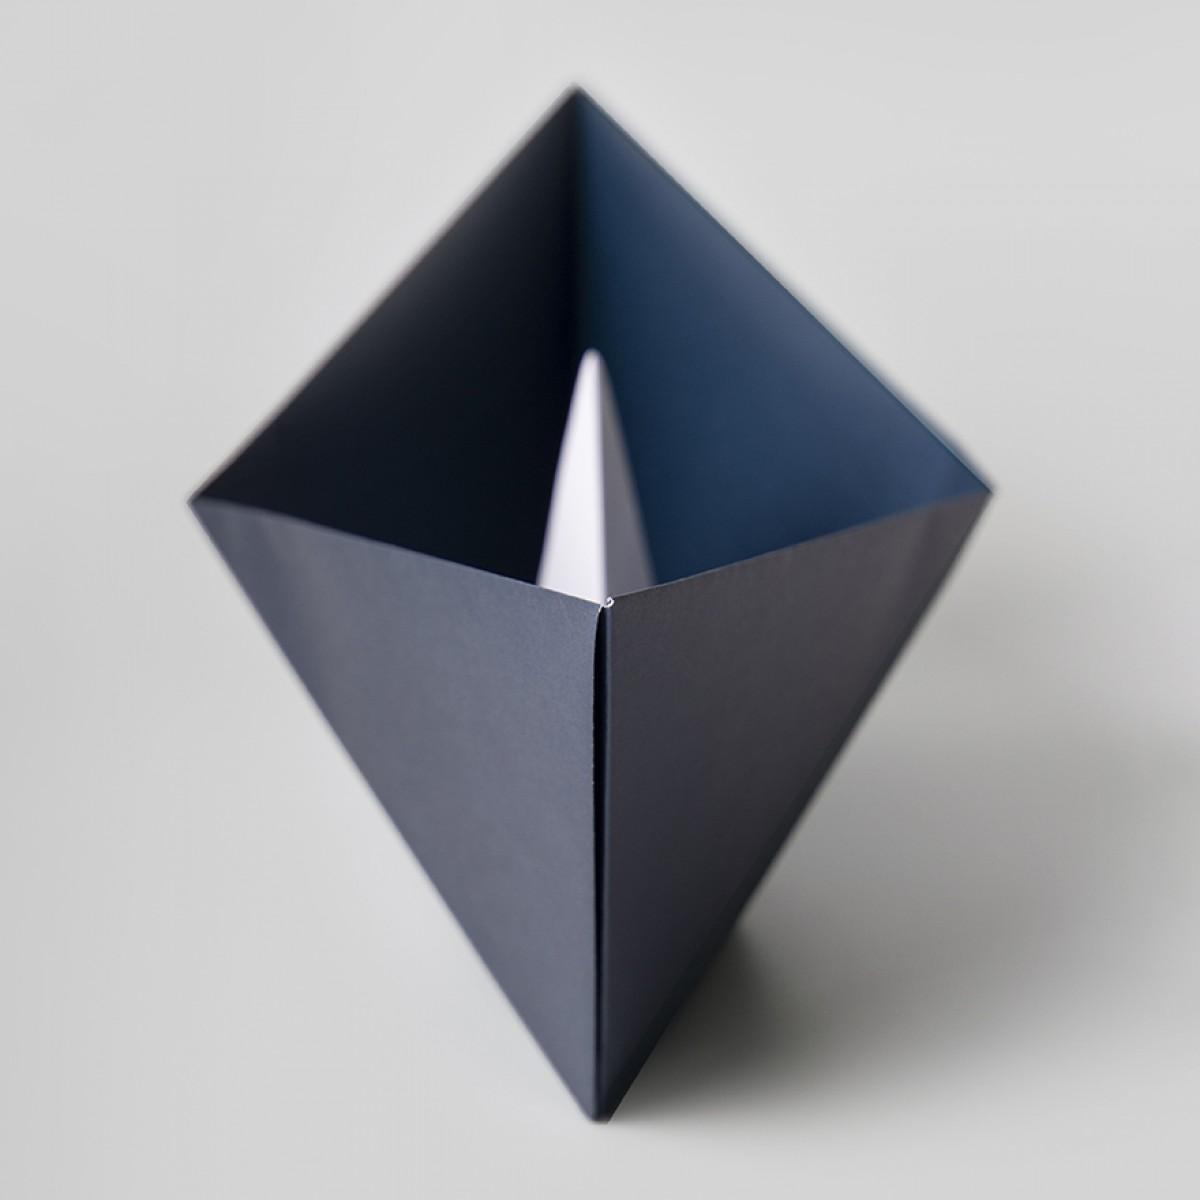 Origami Print Papieboot von Christina Pauls